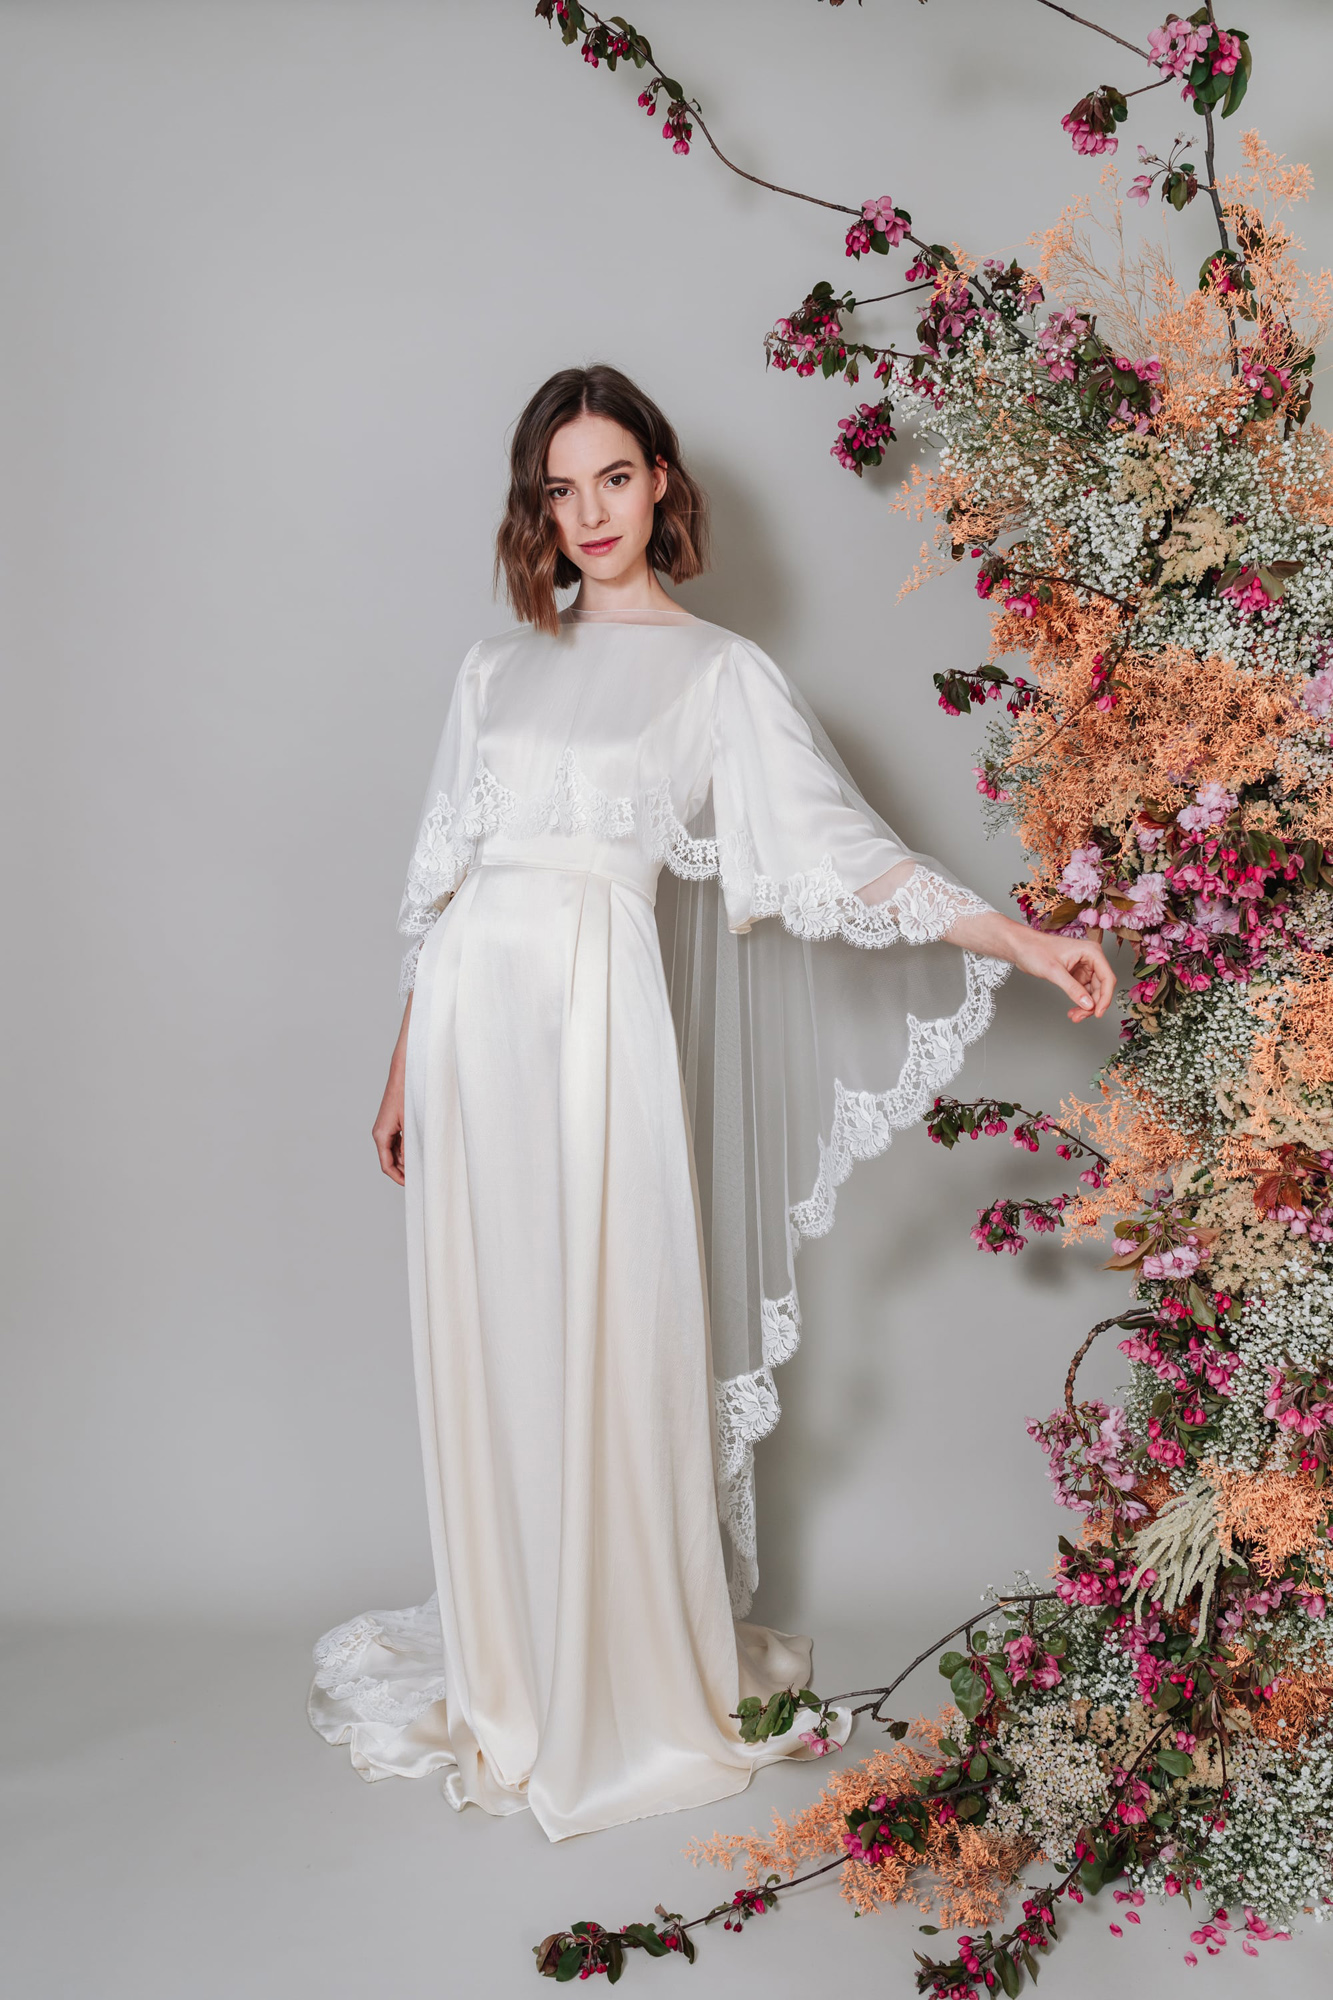 Kate-Beaumont-Lunaria-Bohemian-Hammered-Silk-Wedding-Dress-Sleeves-17.jpg